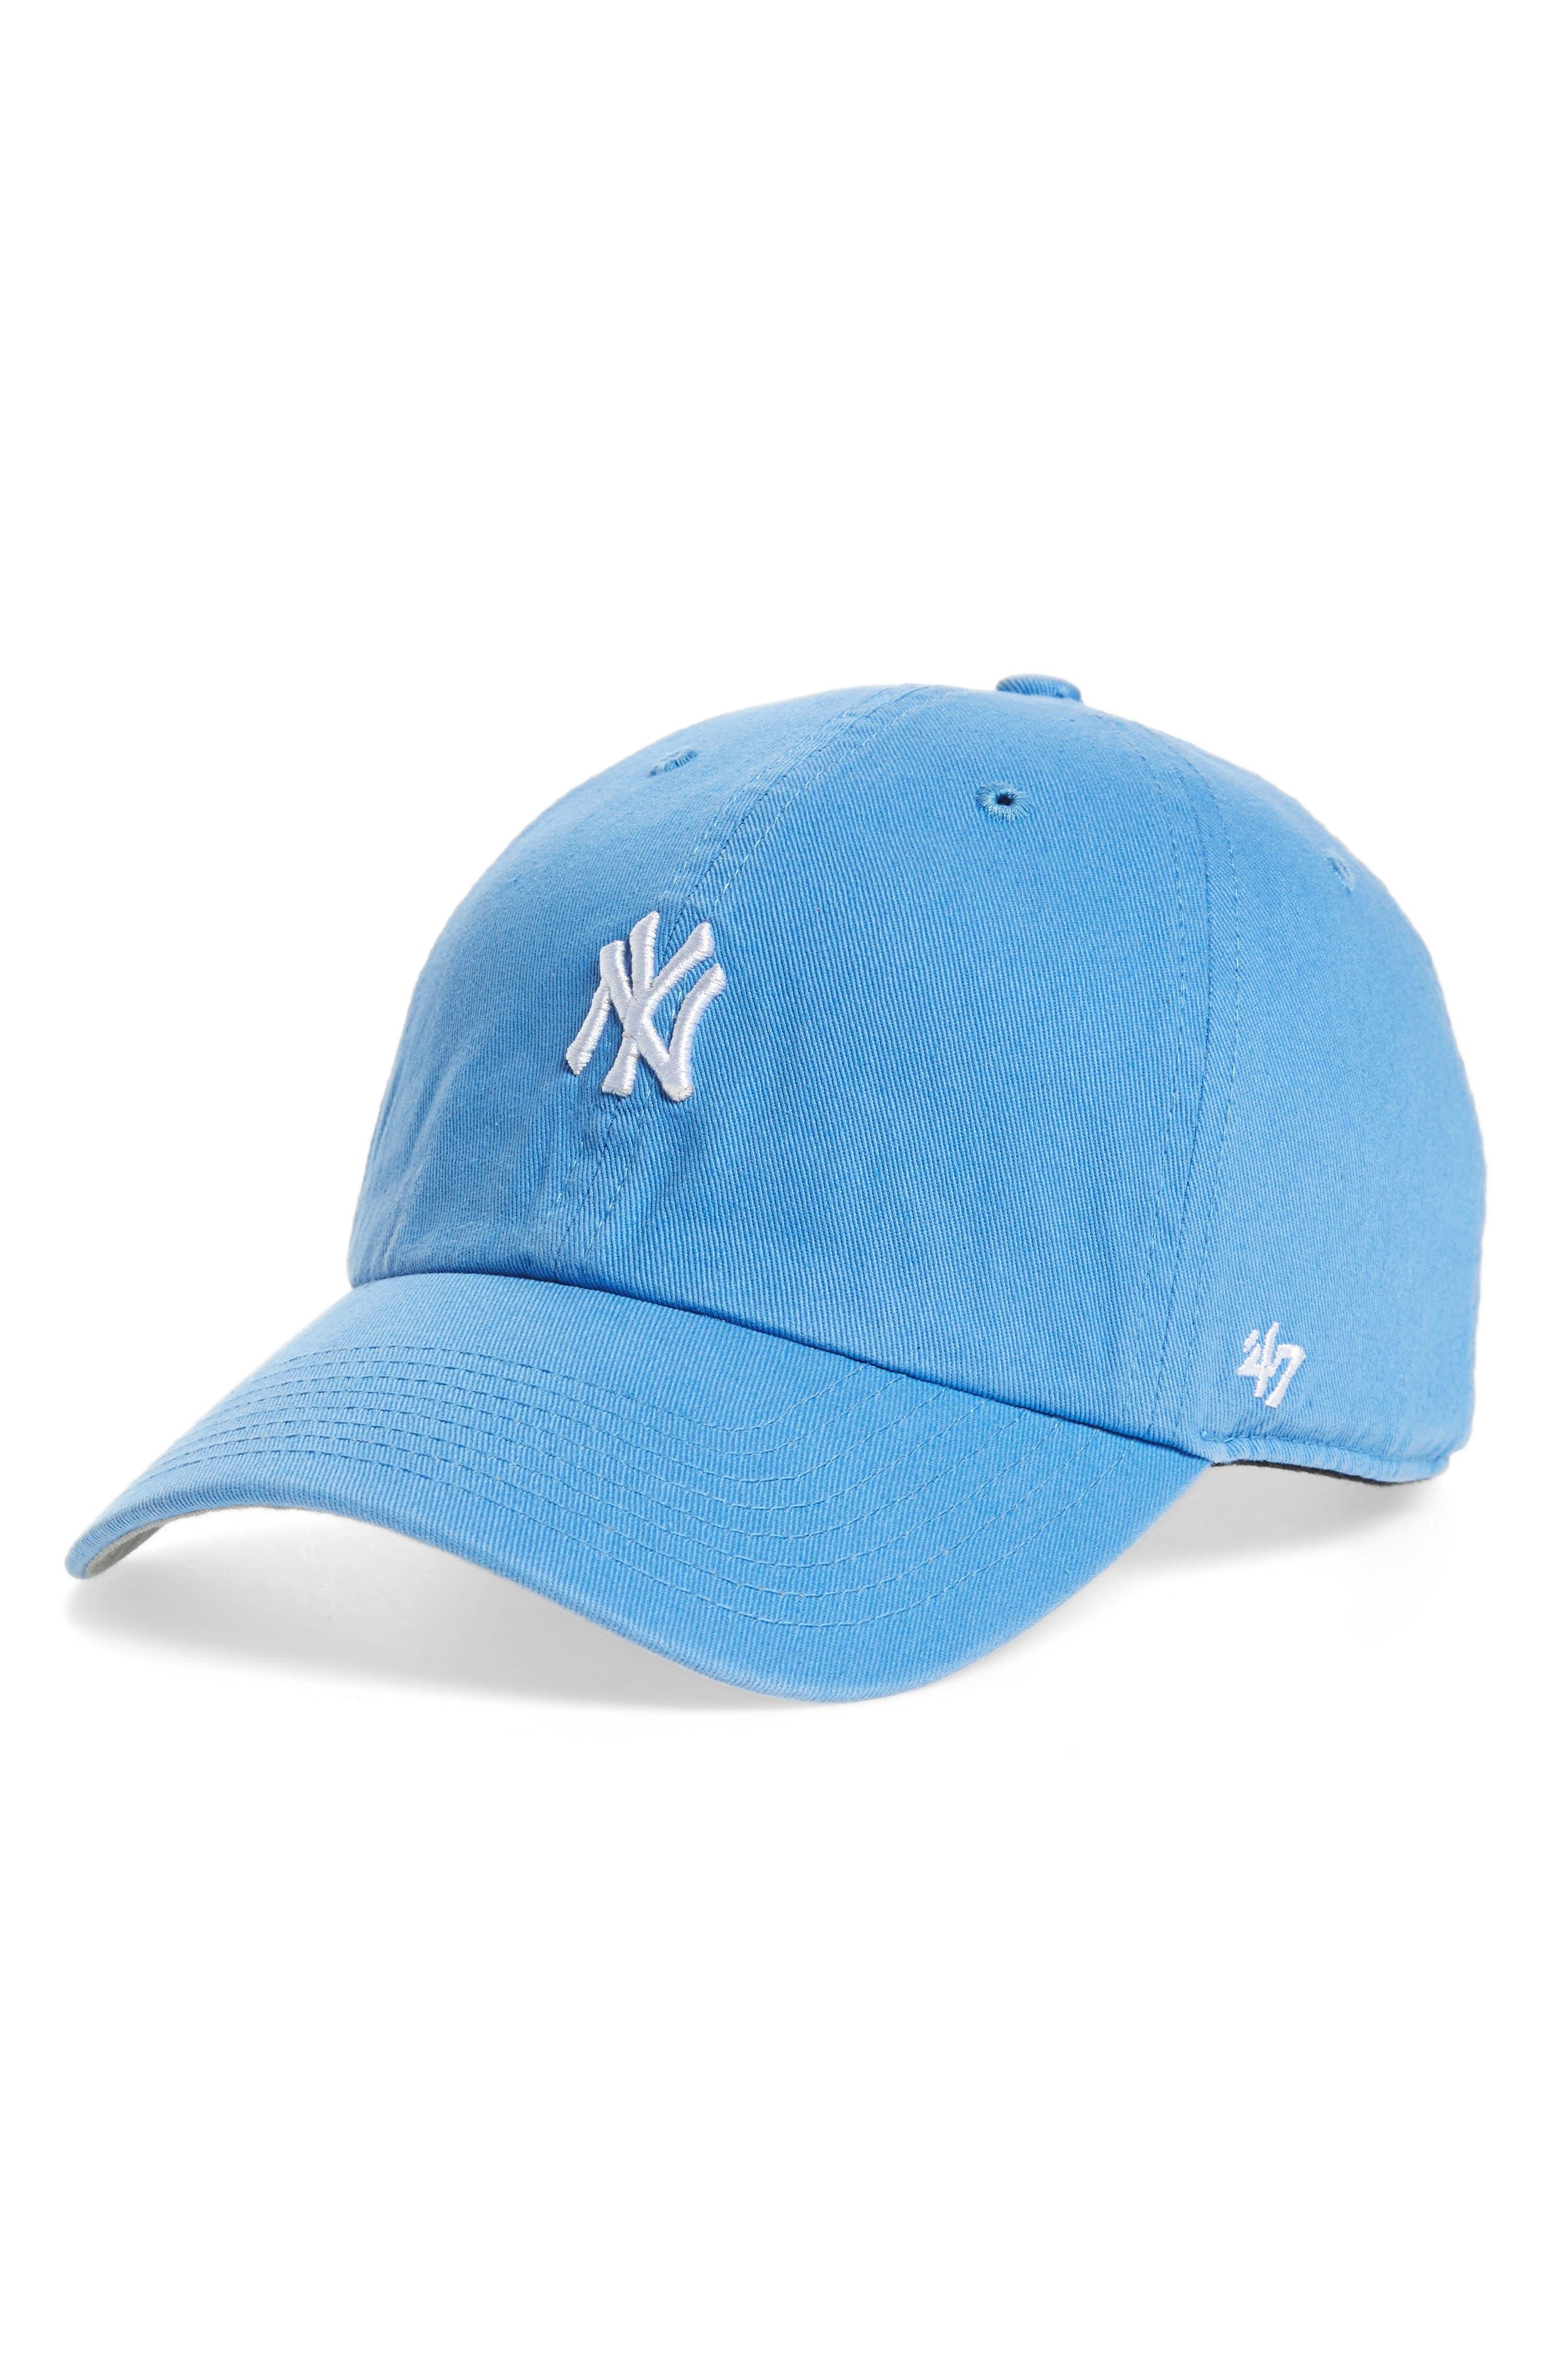 '47 Abate Clean Up NY Yankees Ball Cap